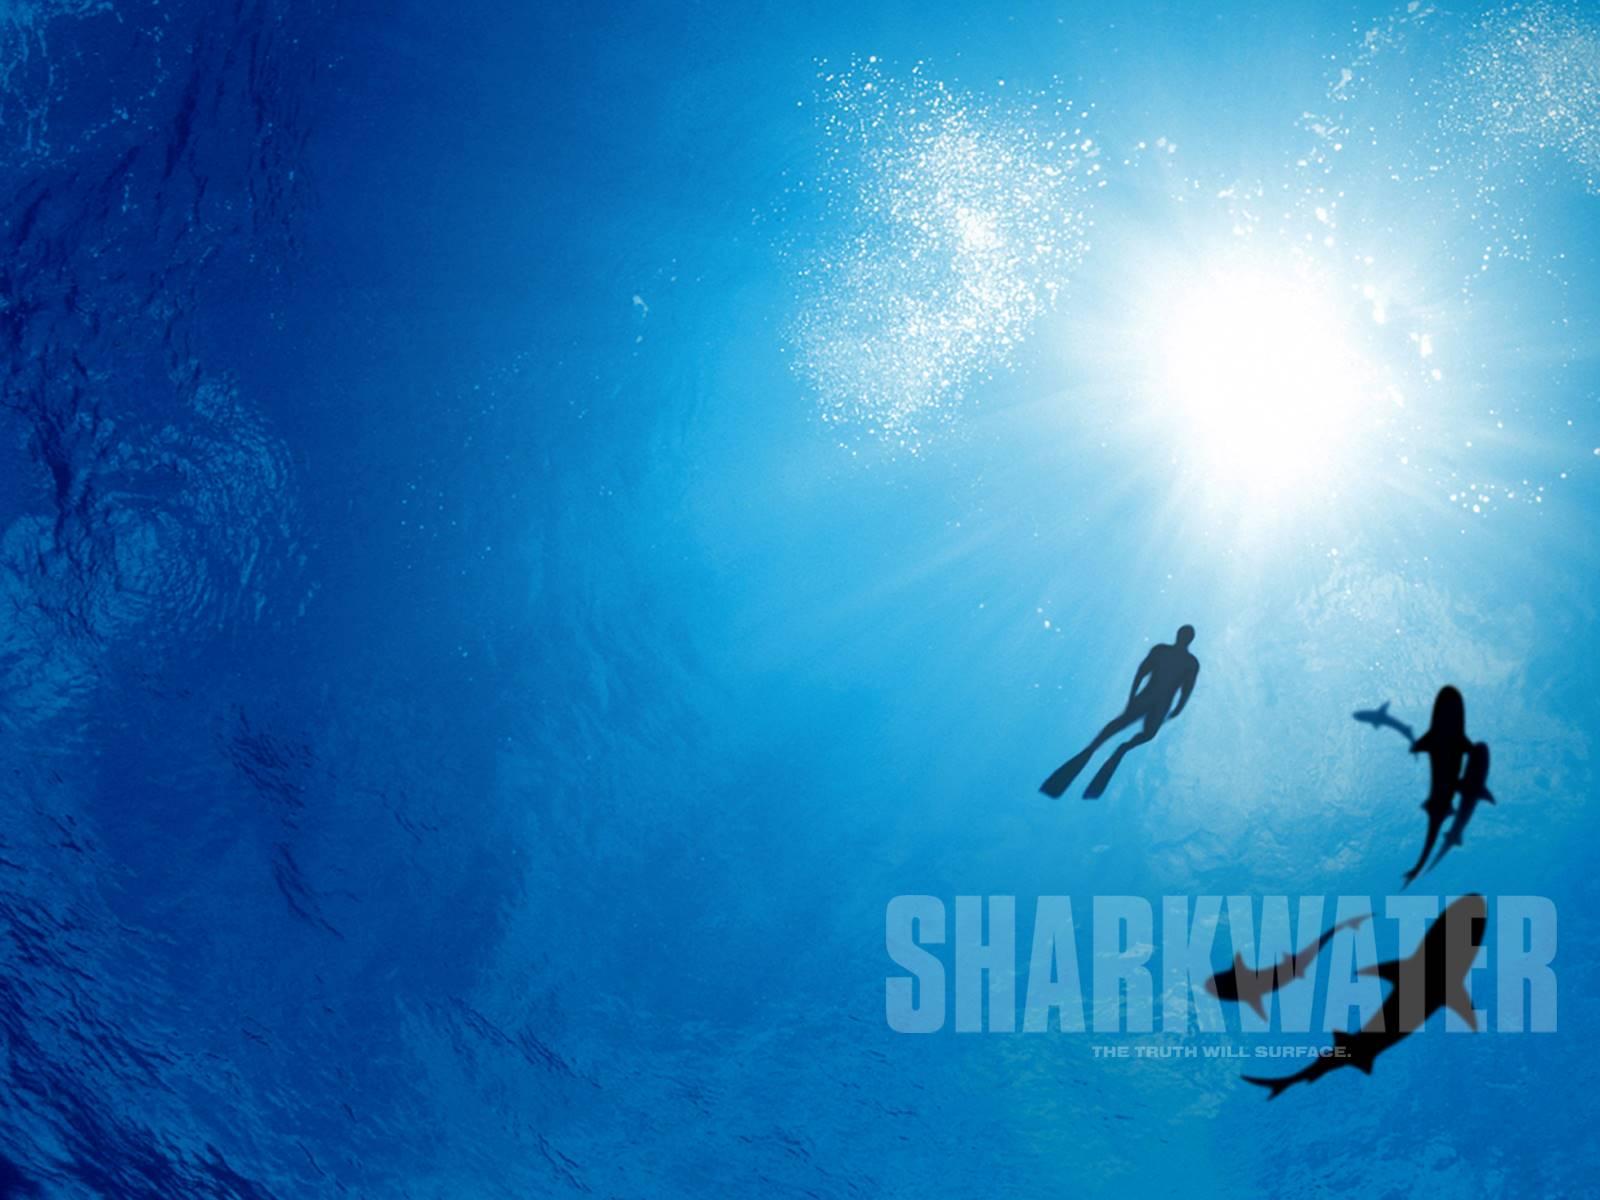 www.sharkwater.com